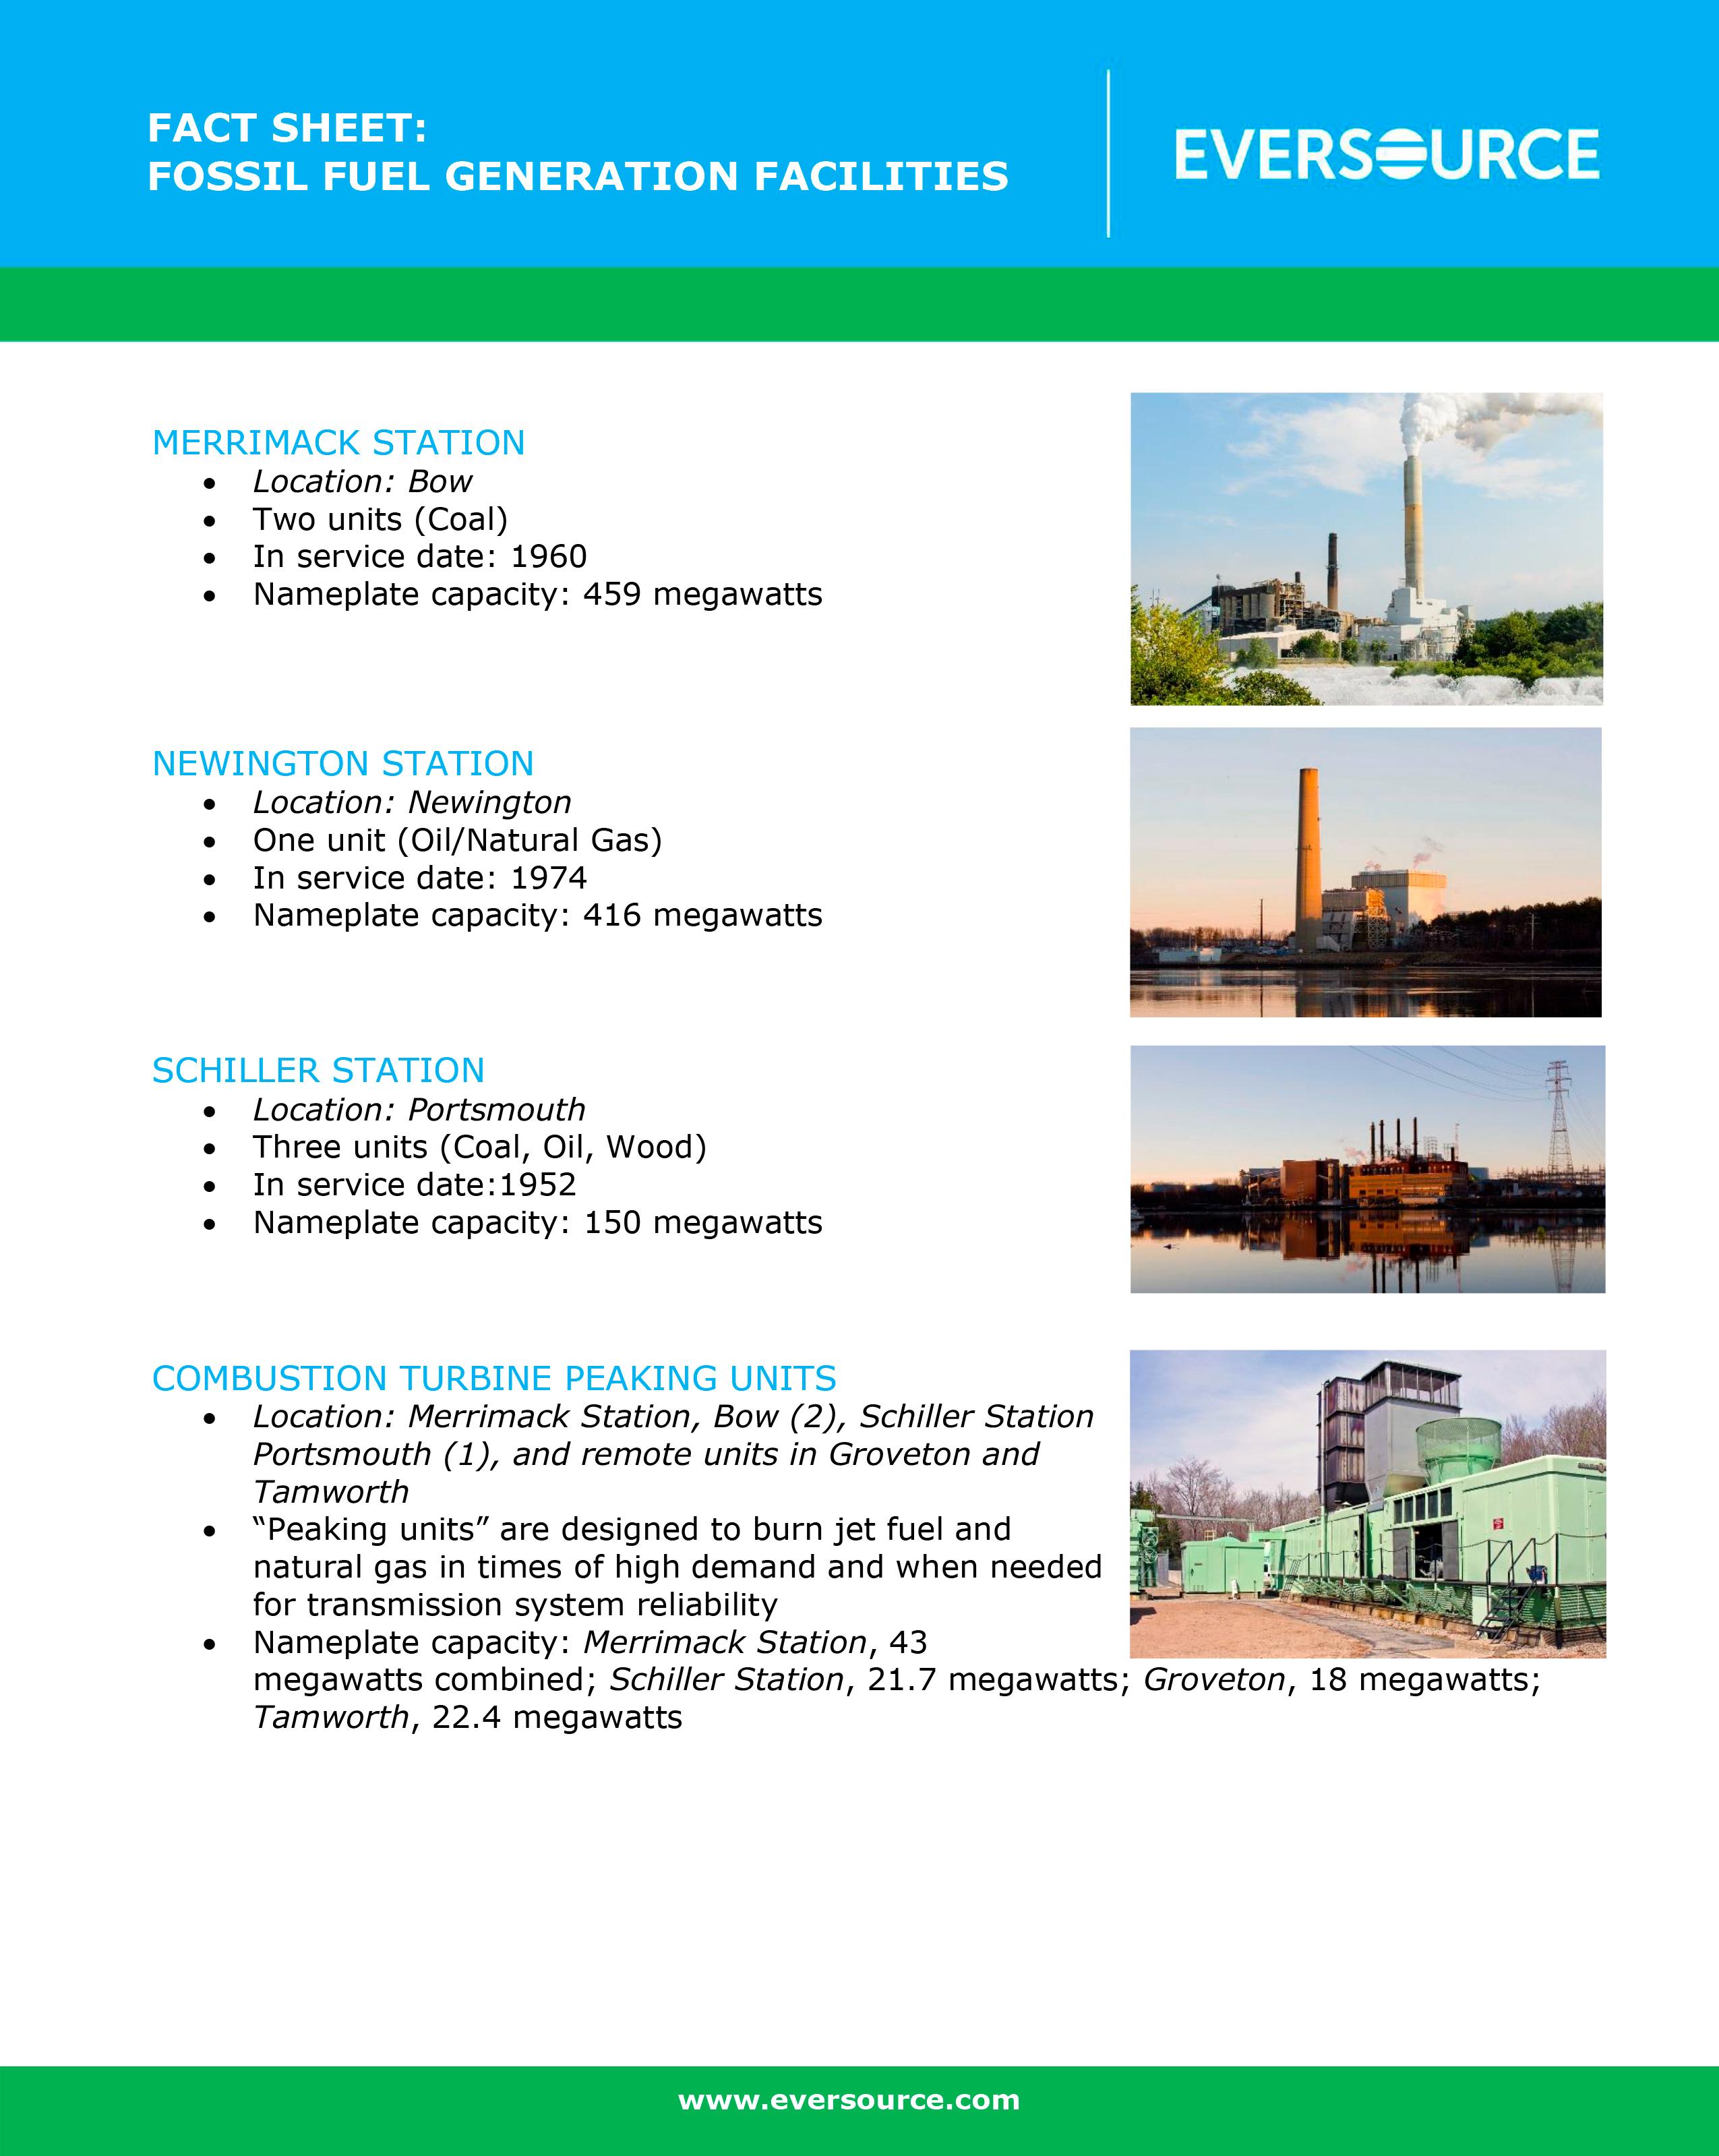 Eversource Announces Sale of Power Plants